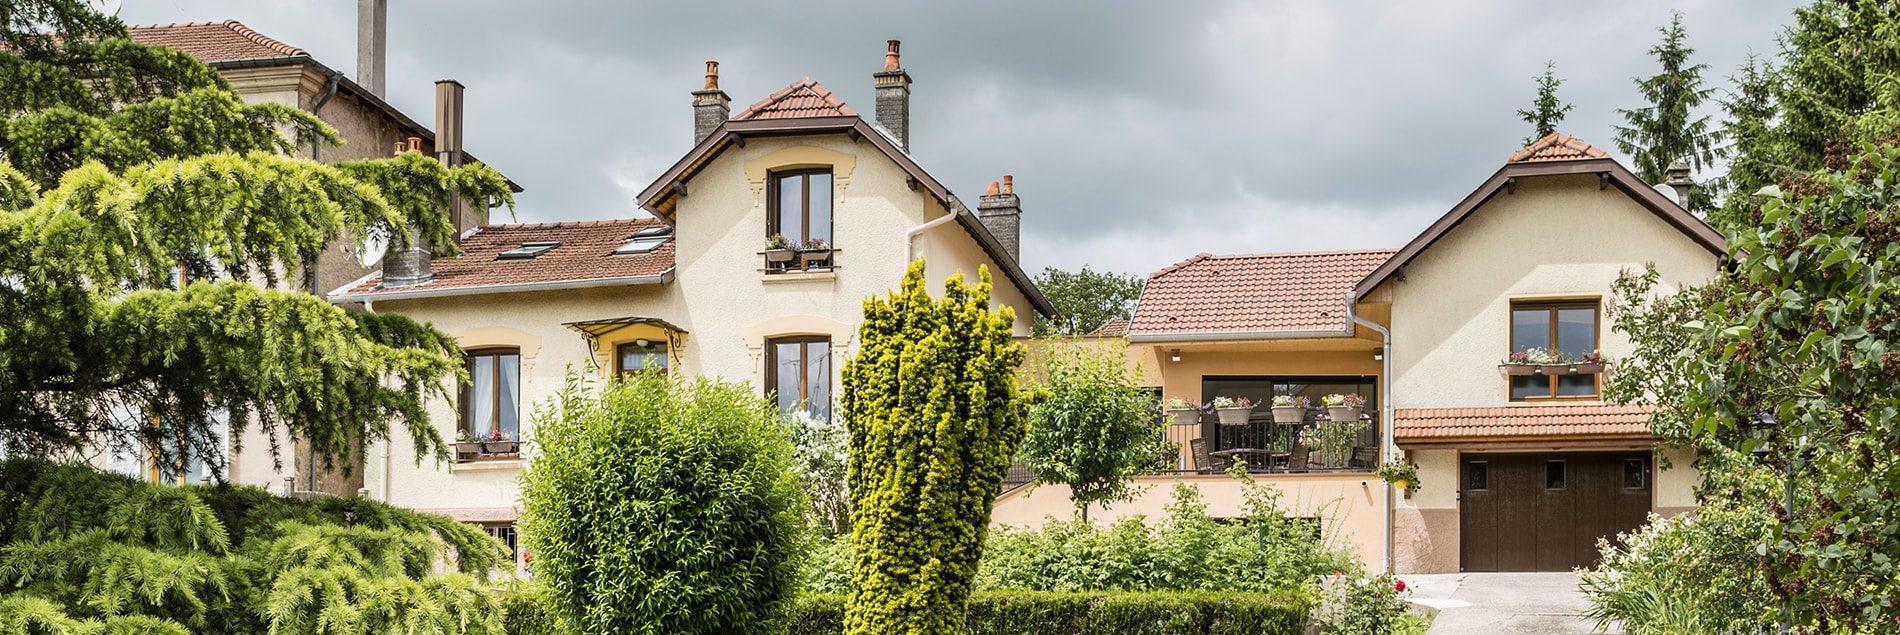 agrandir sa maison à Dijon